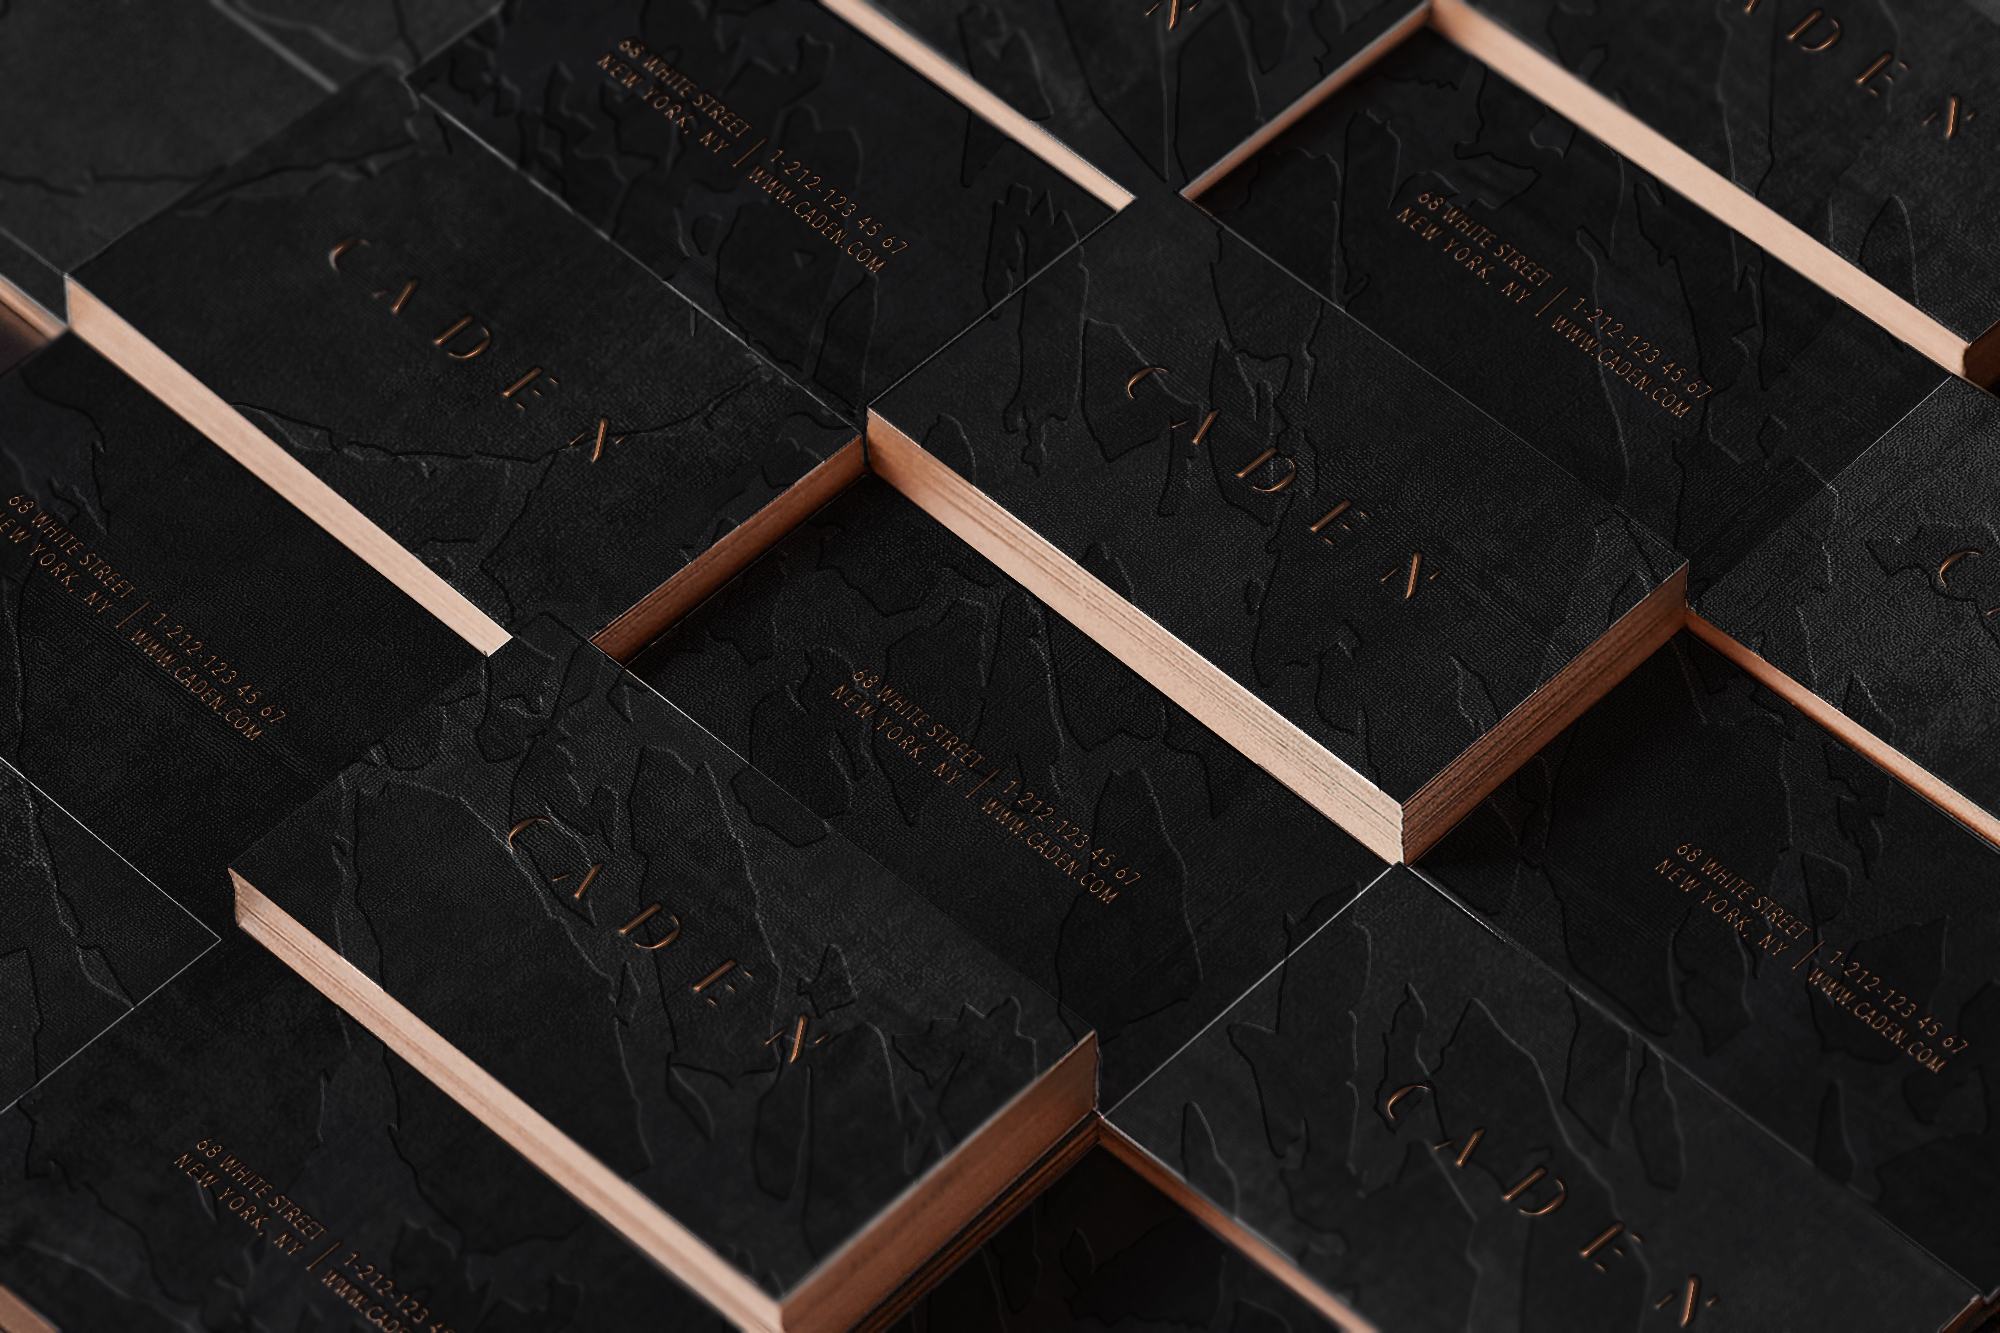 Clandestine luxury branding for a subterranean membership club located New York City.